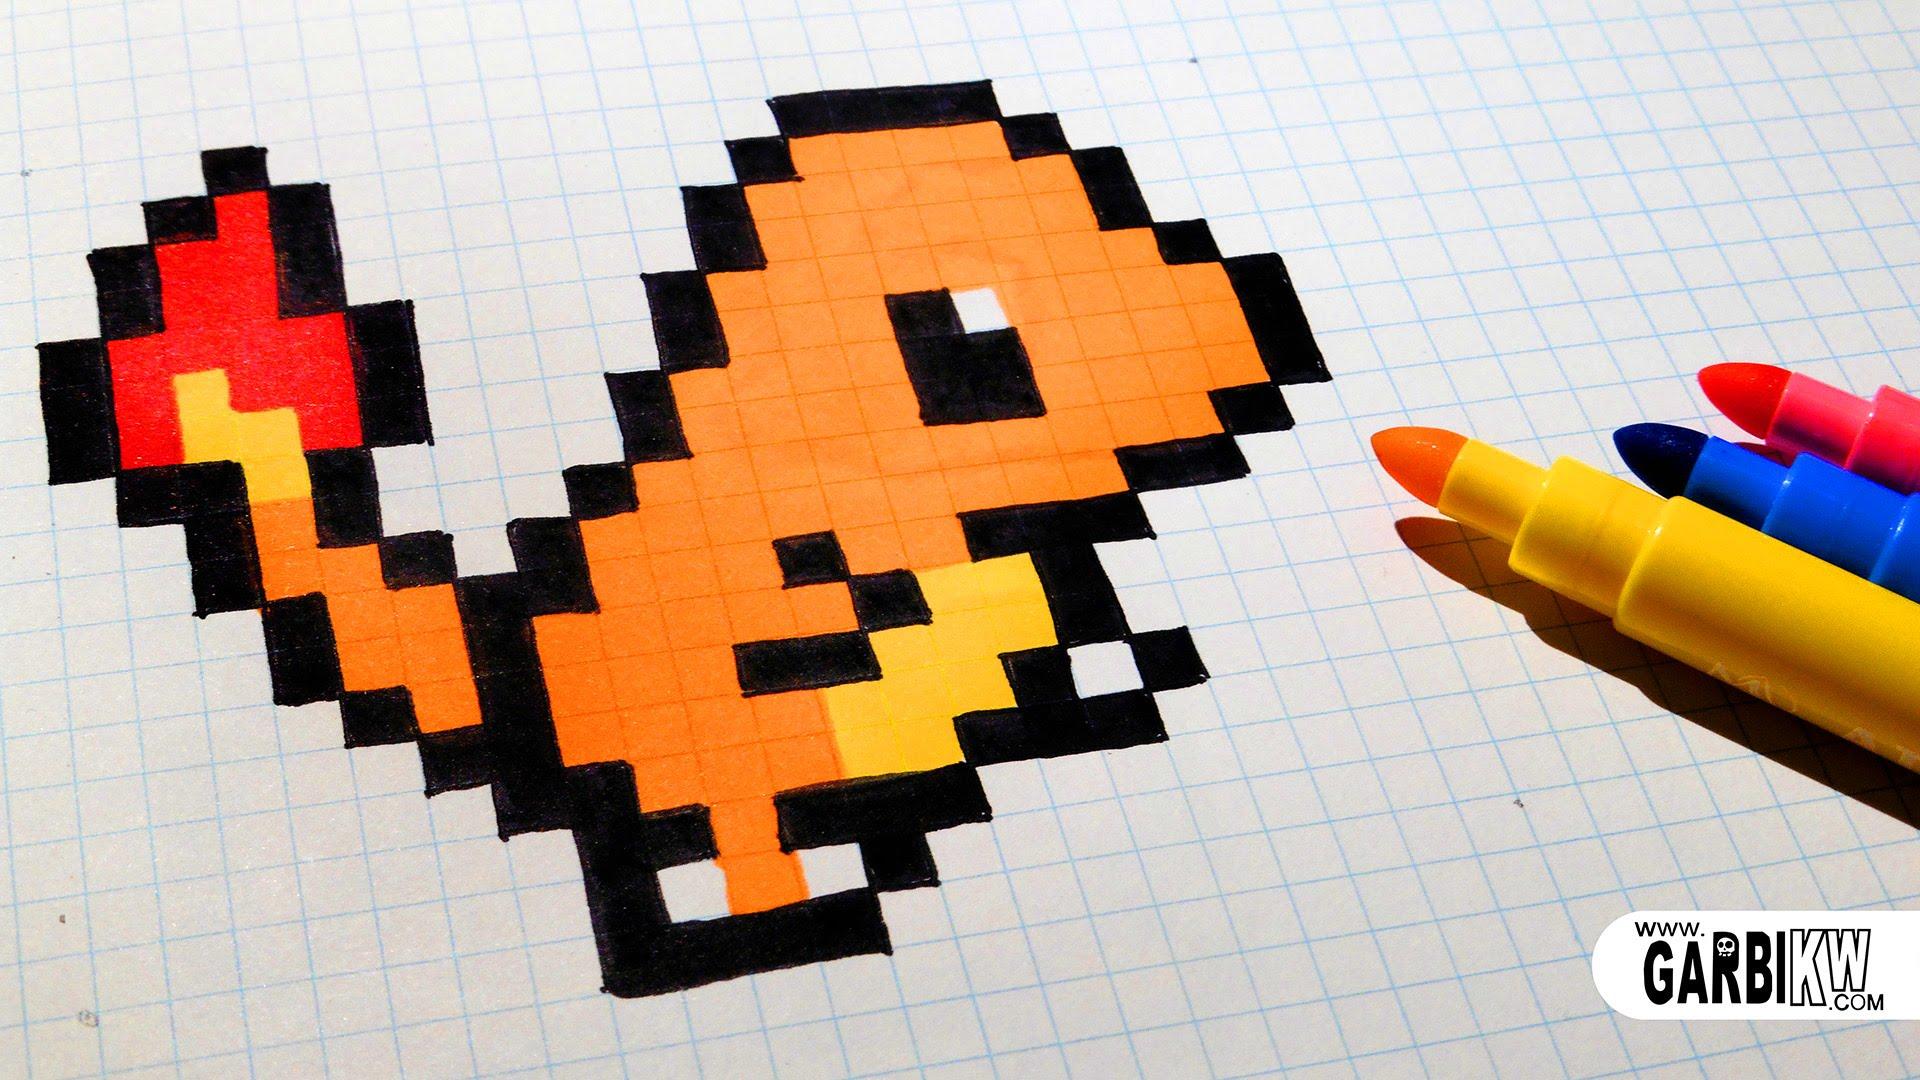 Drawn pixel art charmeleon Draw YouTube Art Handmade How